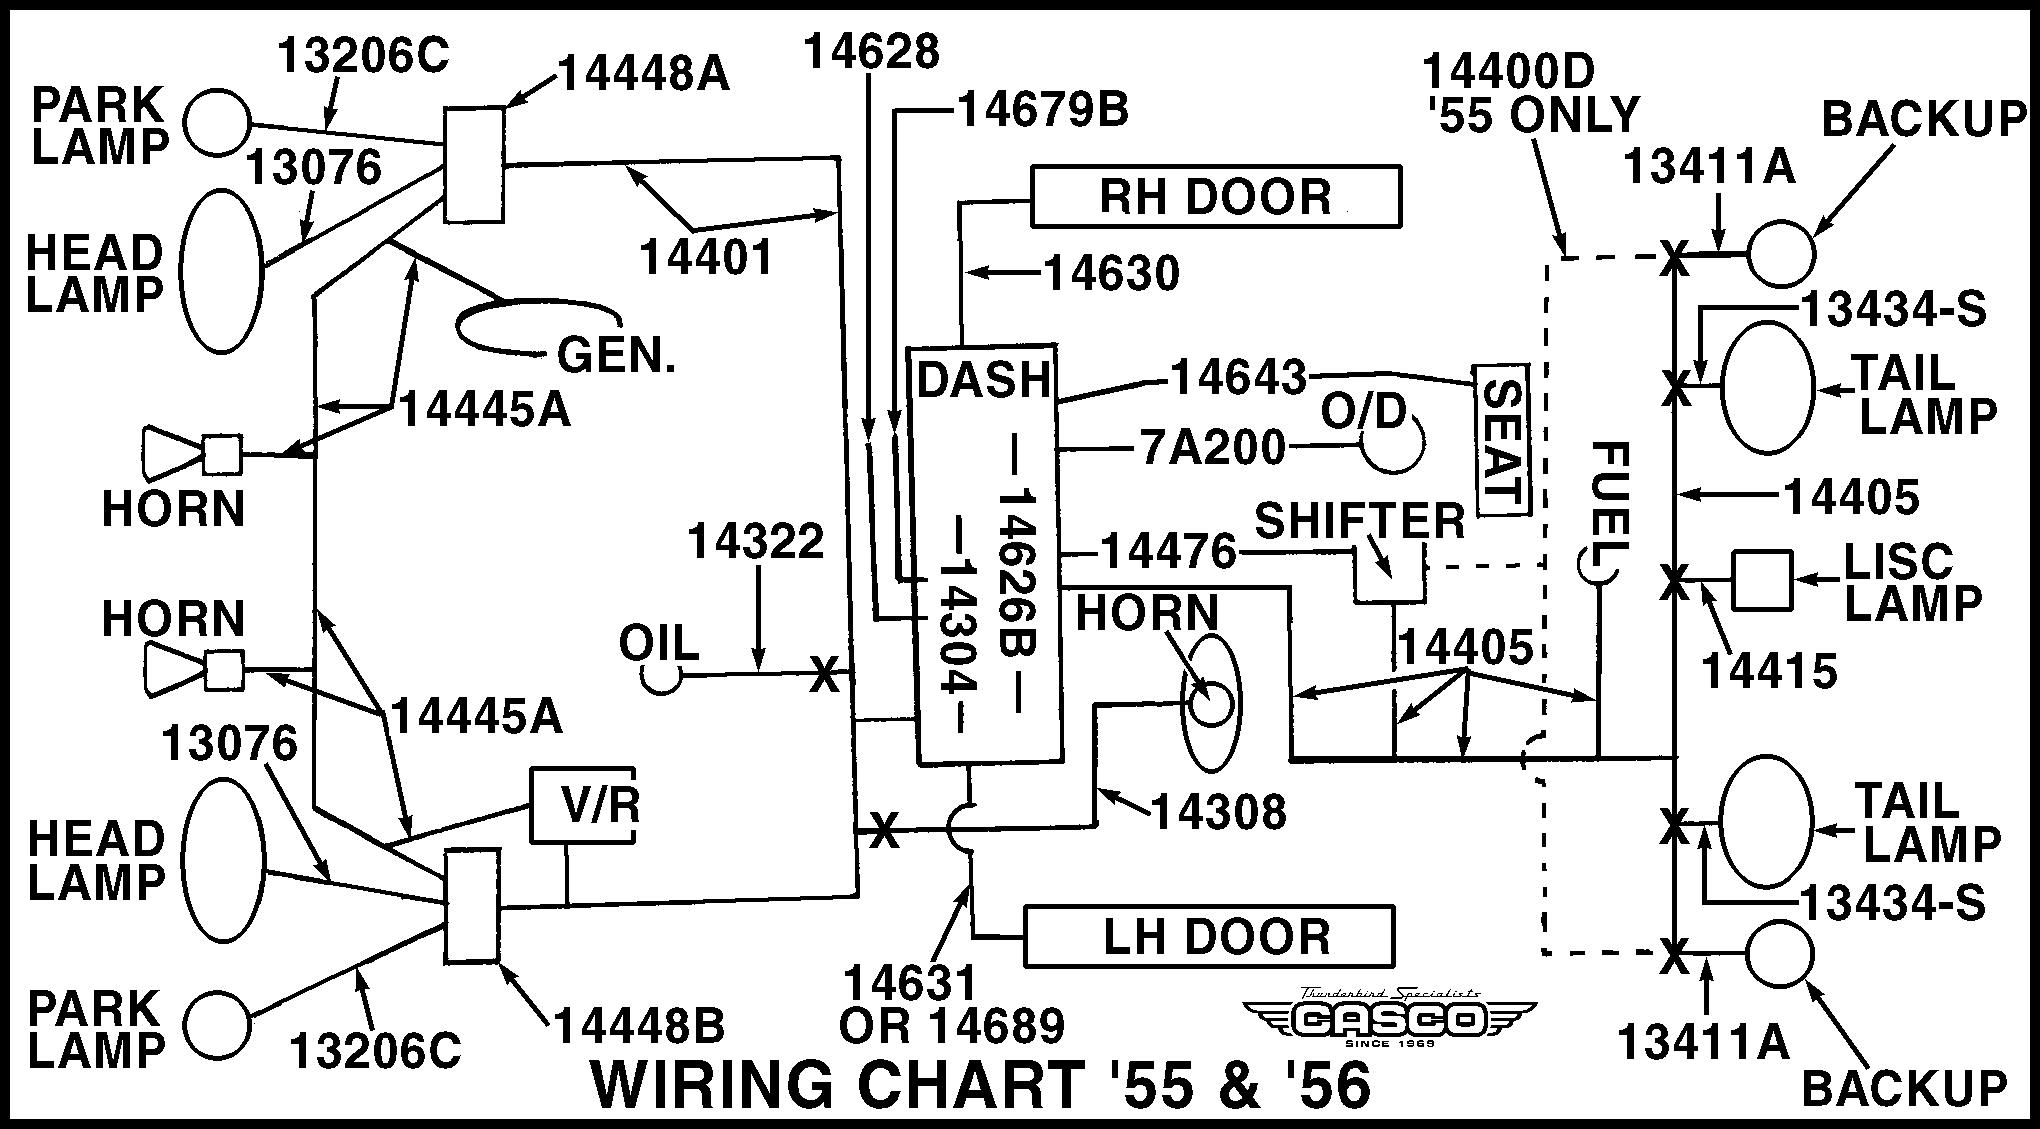 Junction Block Single Stack 55 6 1 Per Car Wiring Images Wiringchart 56